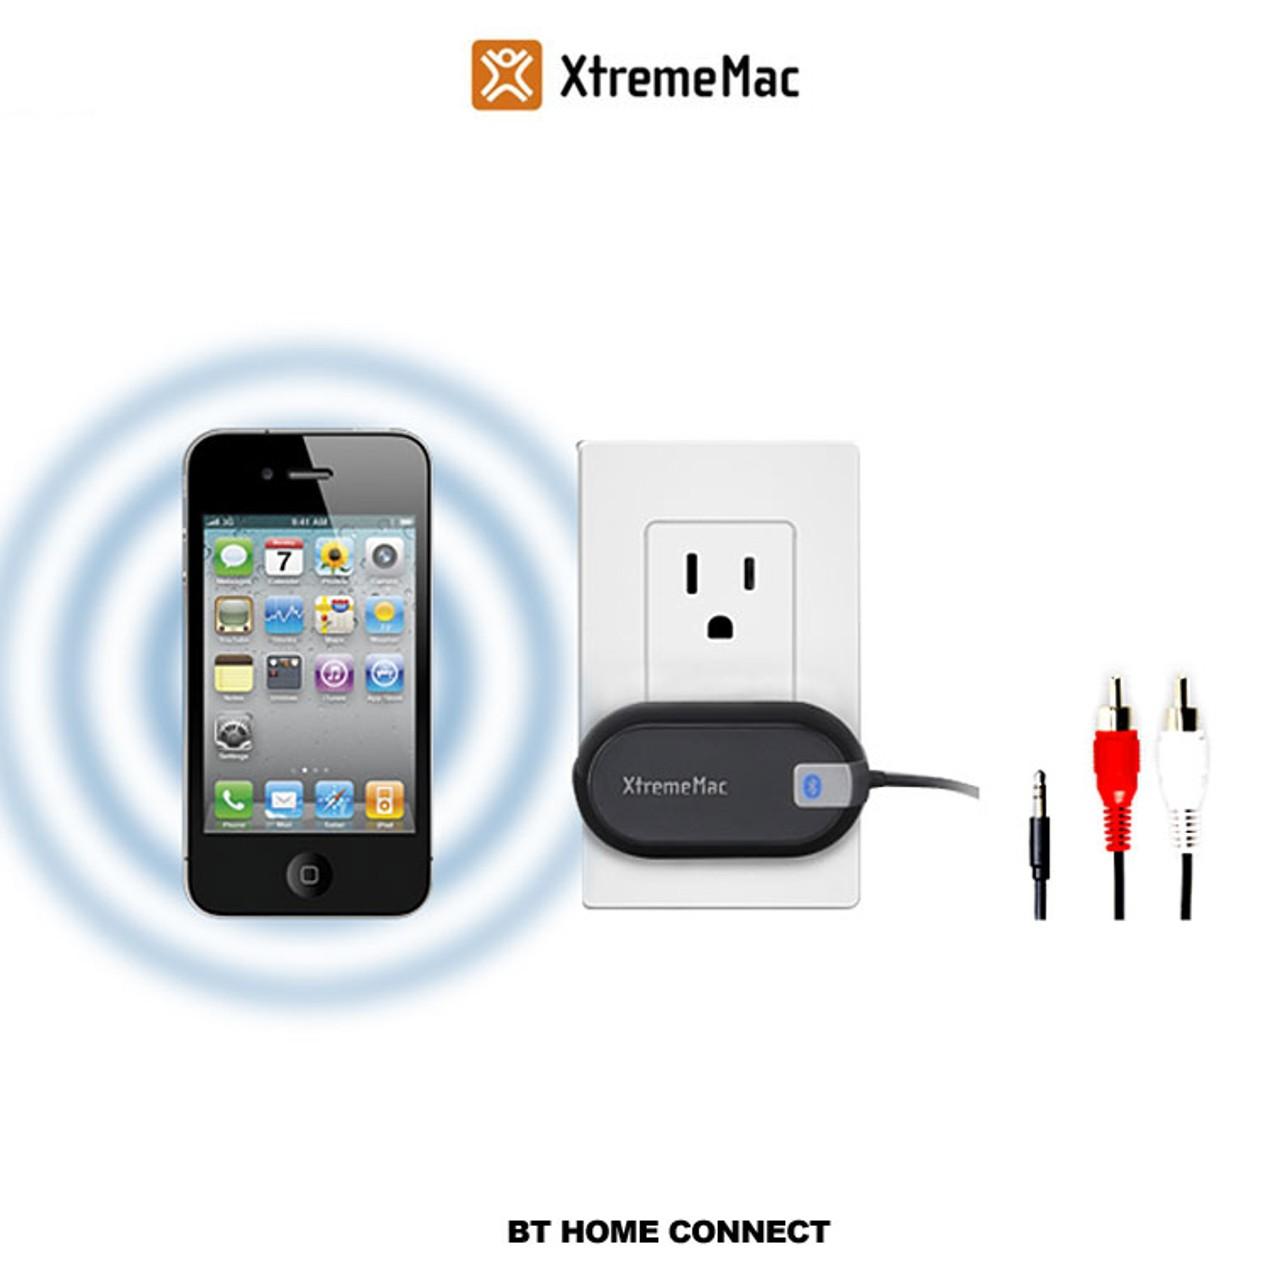 XtremeMac BT Home Connect Bluetooth Audio Receiver - Tanga